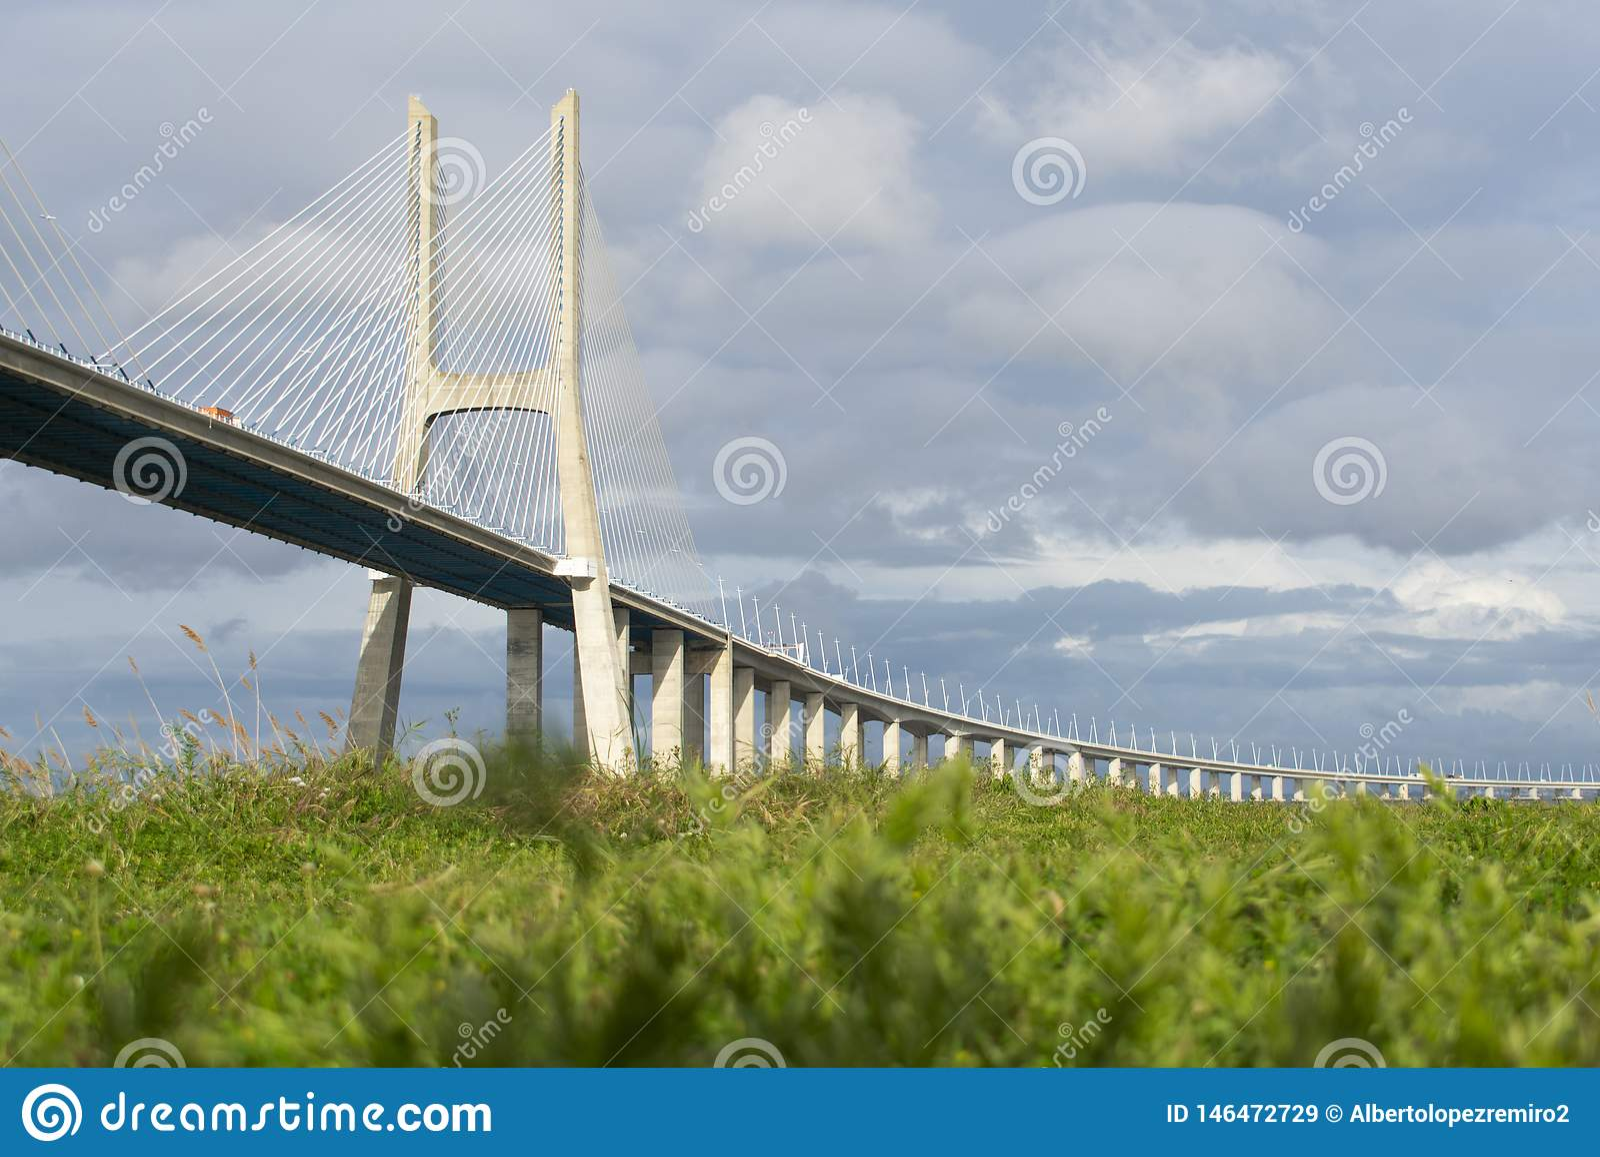 Vasco da Gama Bridge sobre un campo verde